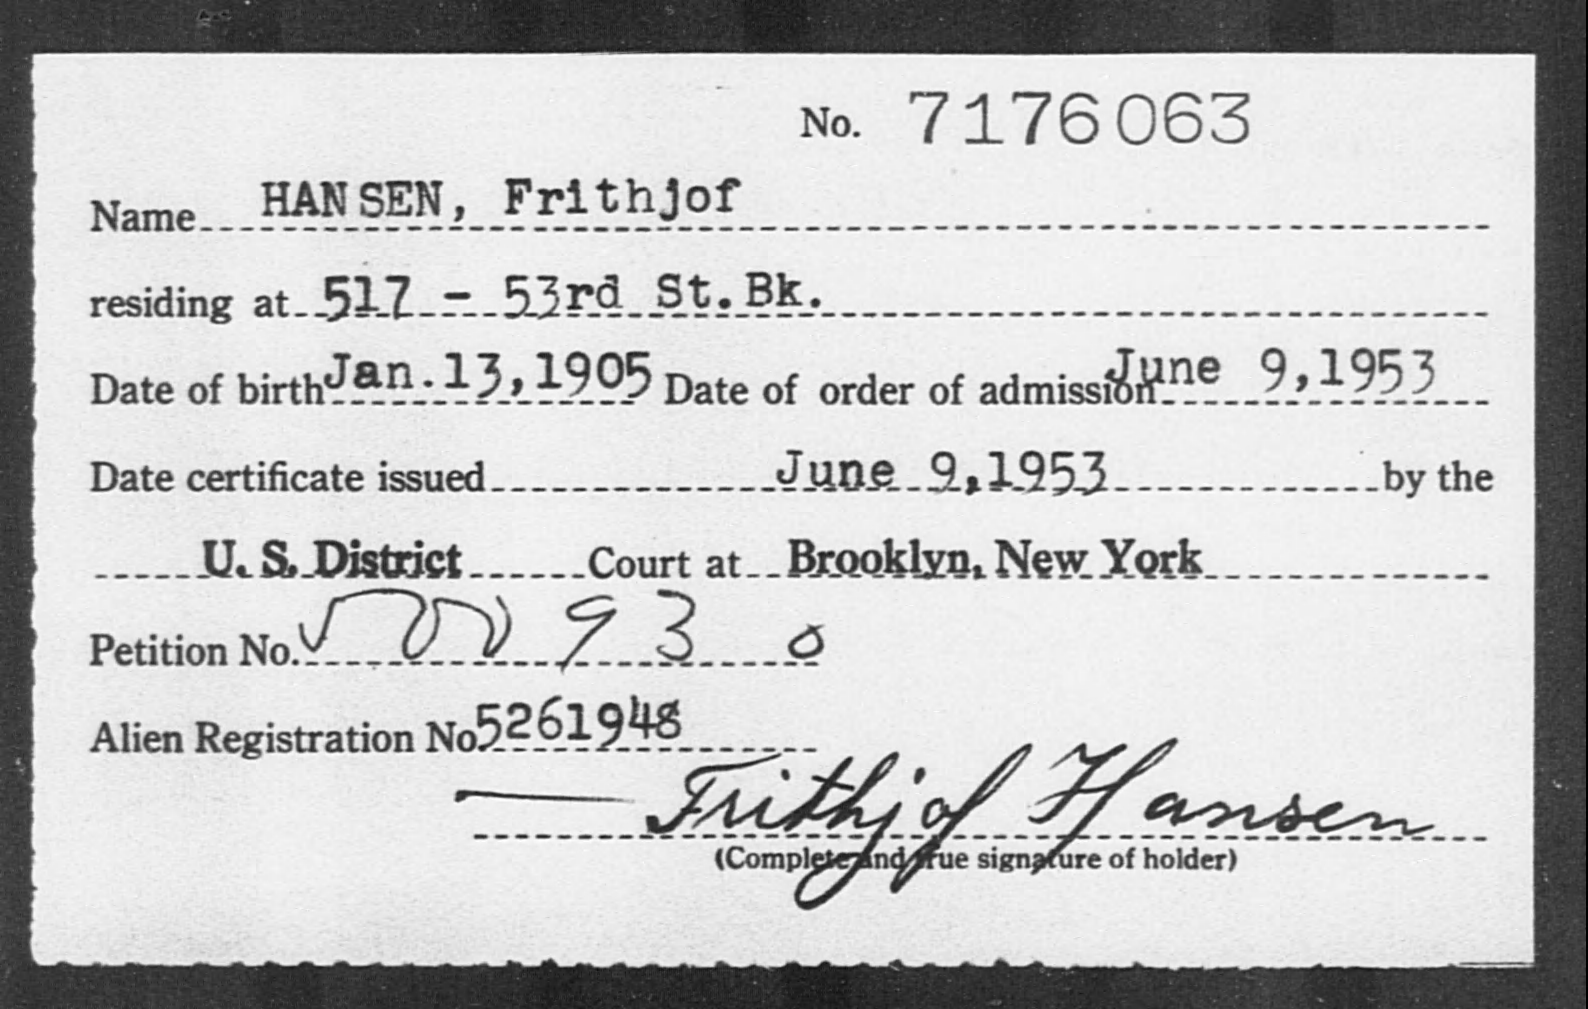 HANSEN, Frithjof - Born: 1905, Naturalized: 1953